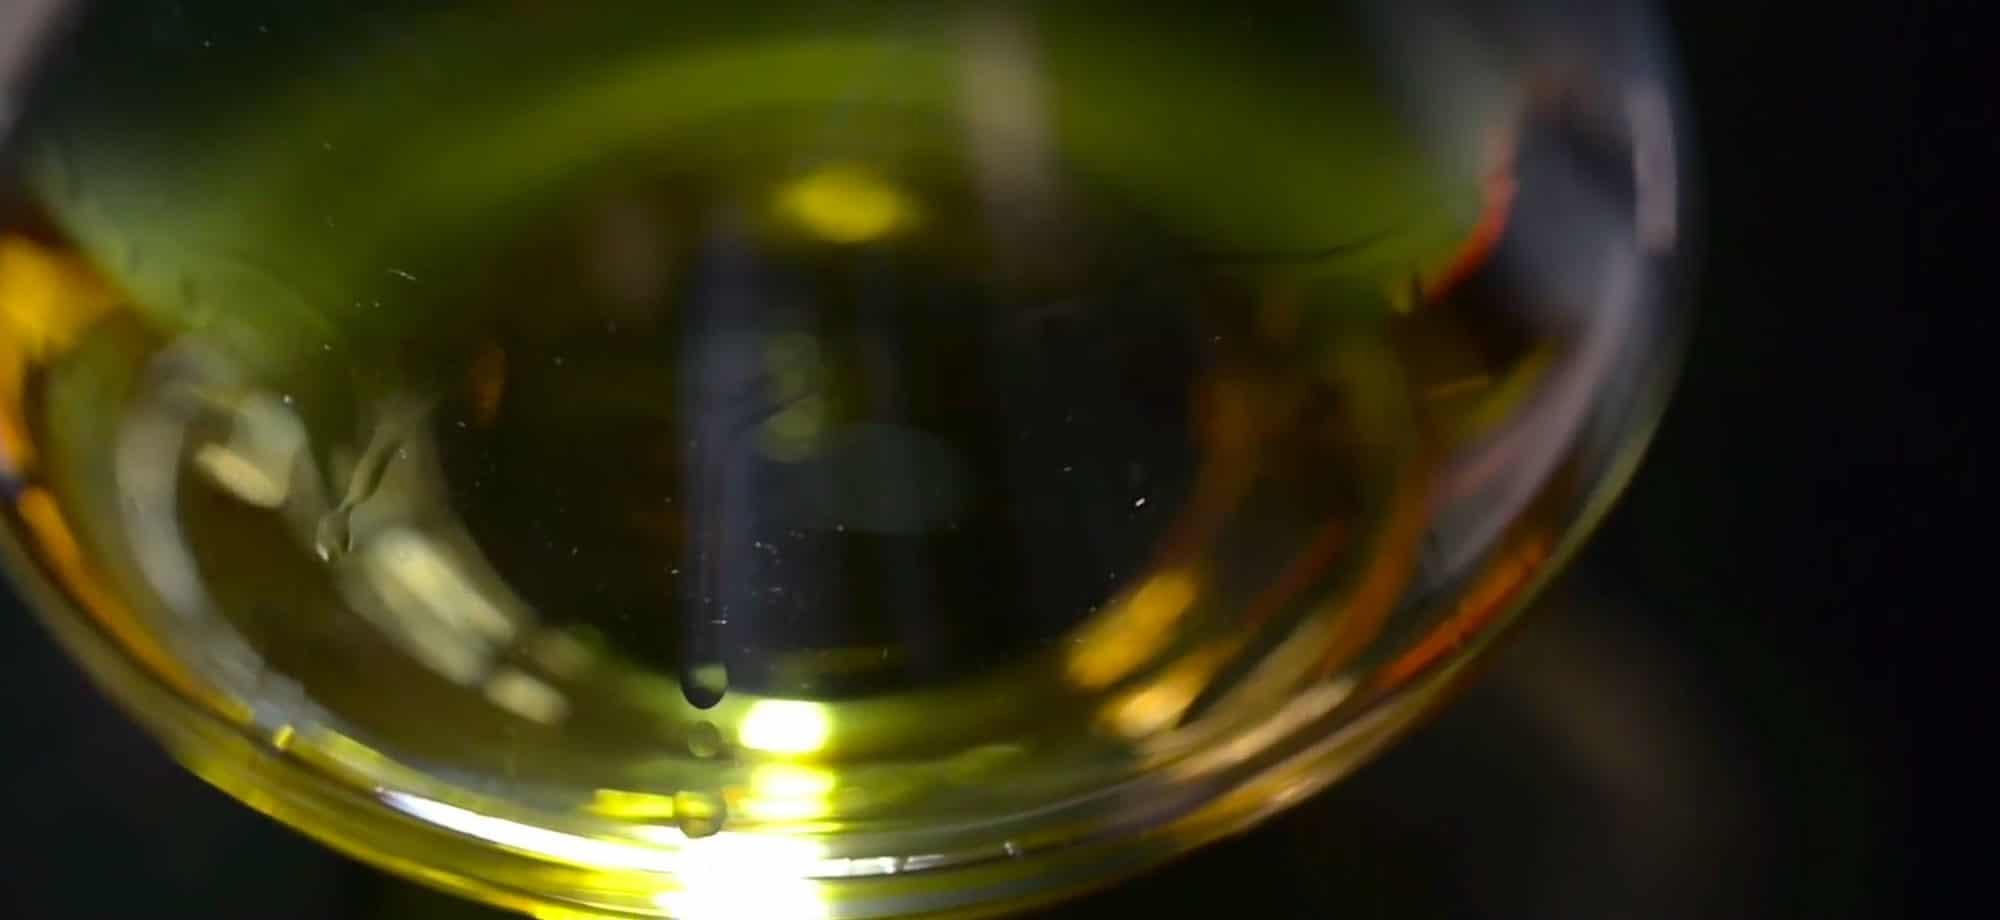 El whisky, una bebida espirituosa universal